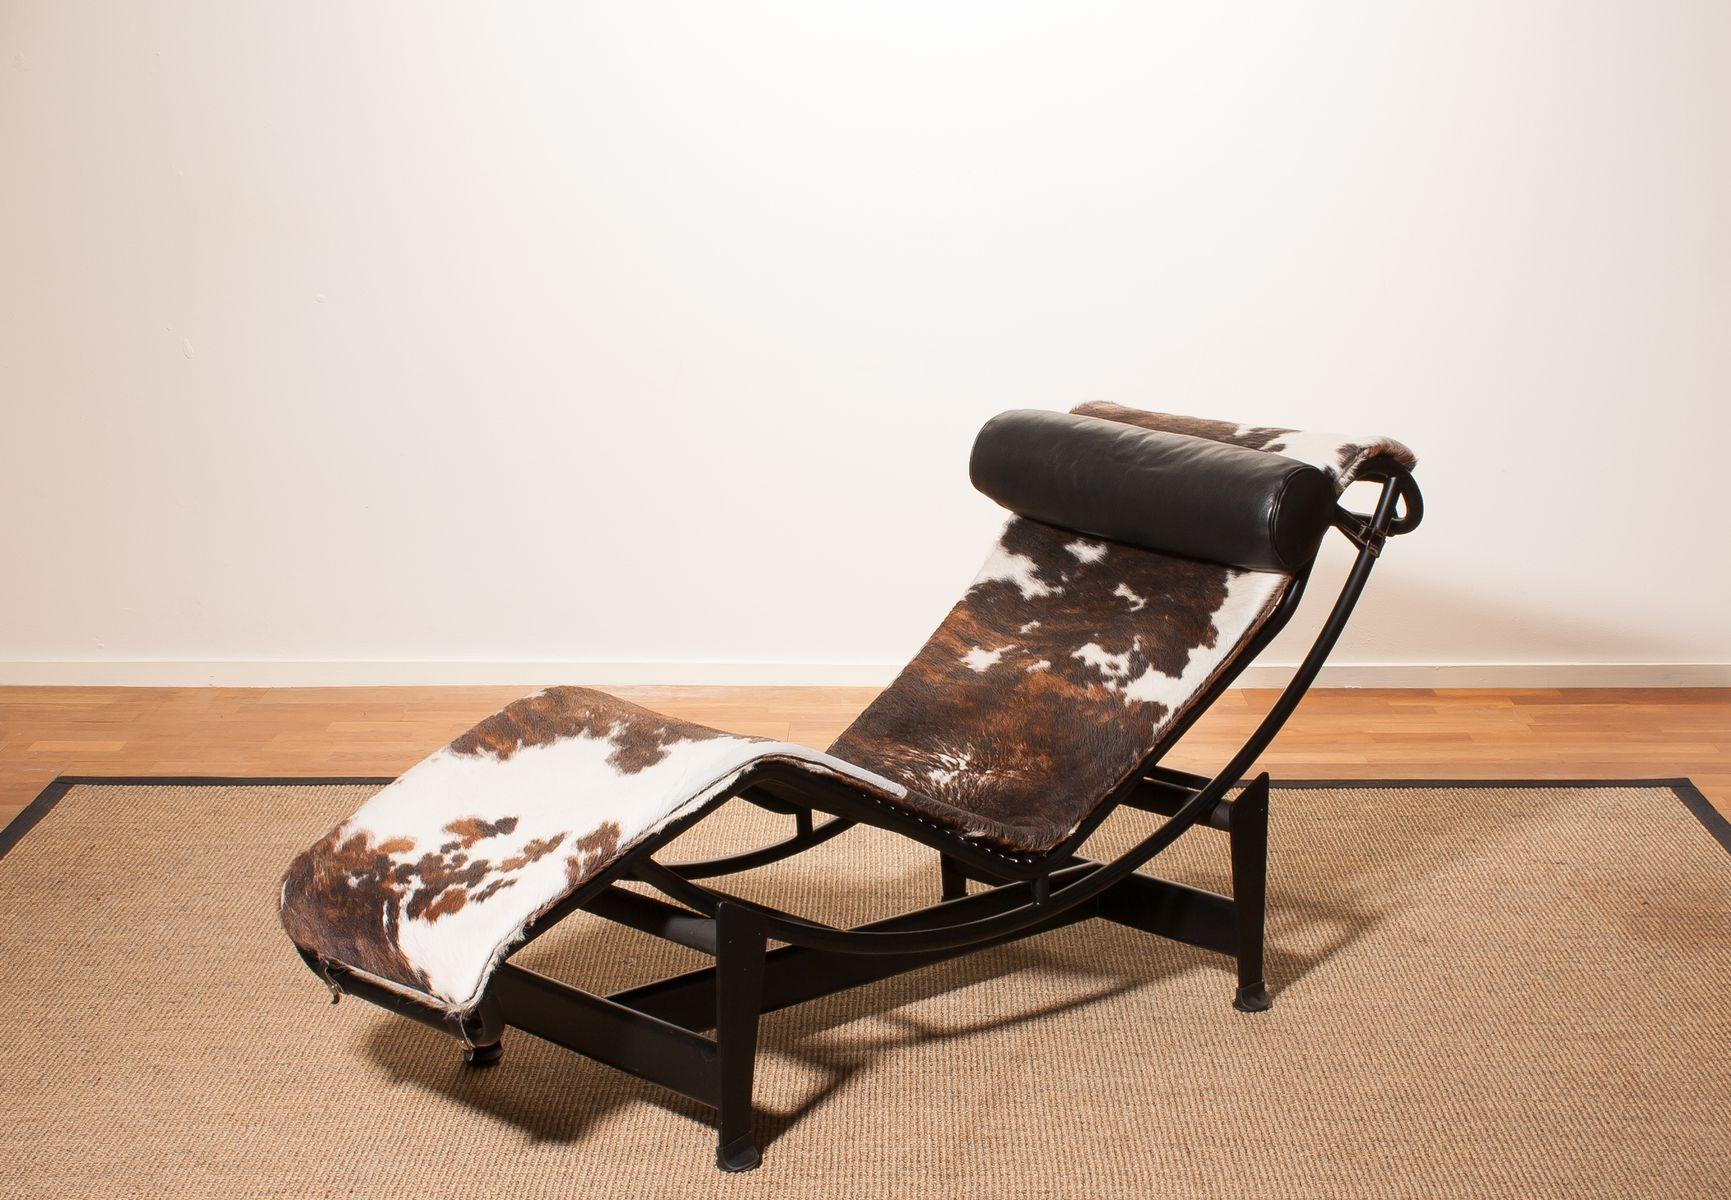 schwarzer modell lc4 sessel von le corbusier f r cassina. Black Bedroom Furniture Sets. Home Design Ideas